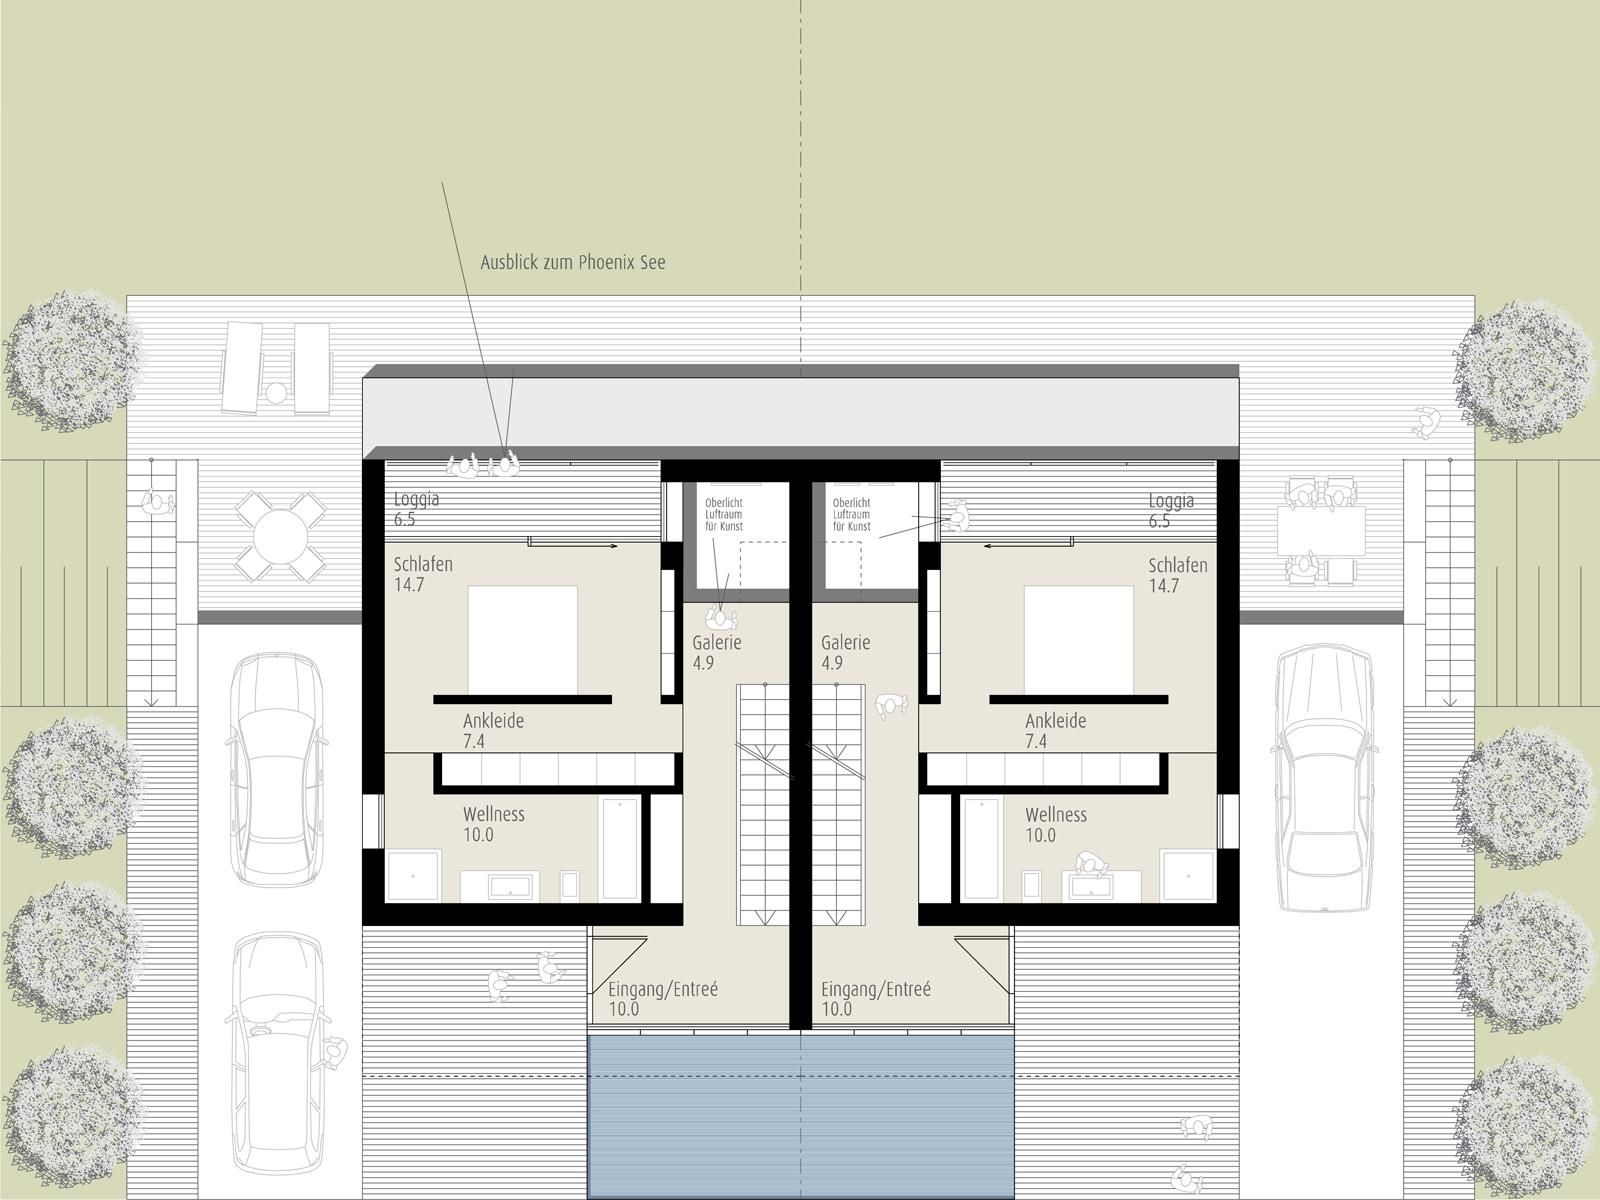 spap D-DOMUND Doppelhaus am Phoenixsee size: 1600 x 1200 post ID: 3 File size: 0 B